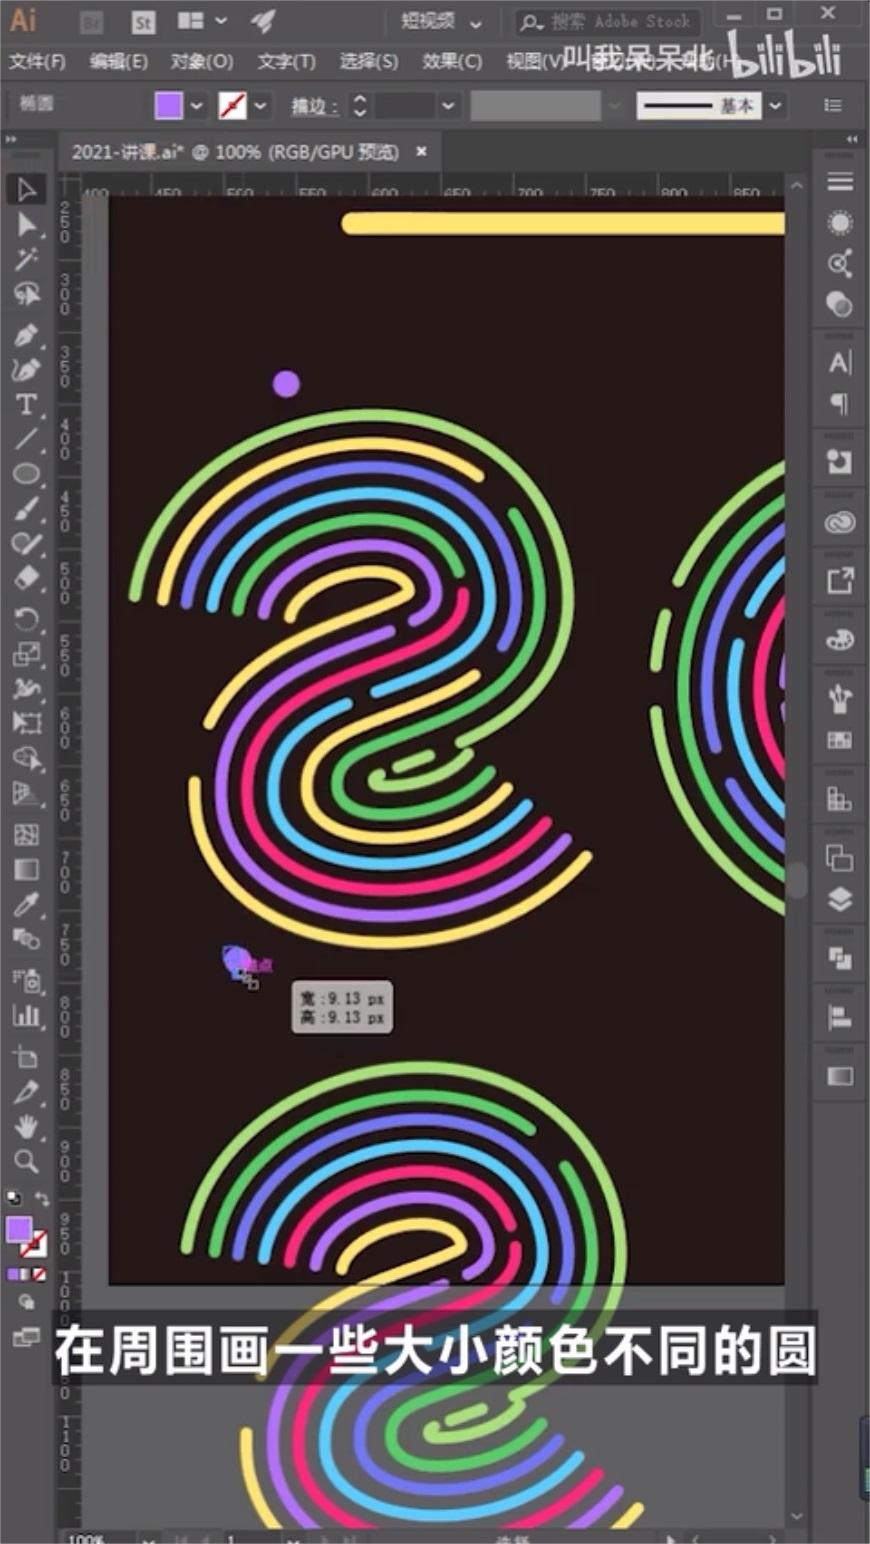 AI教程!充满节日氛围的灯管重叠字效!